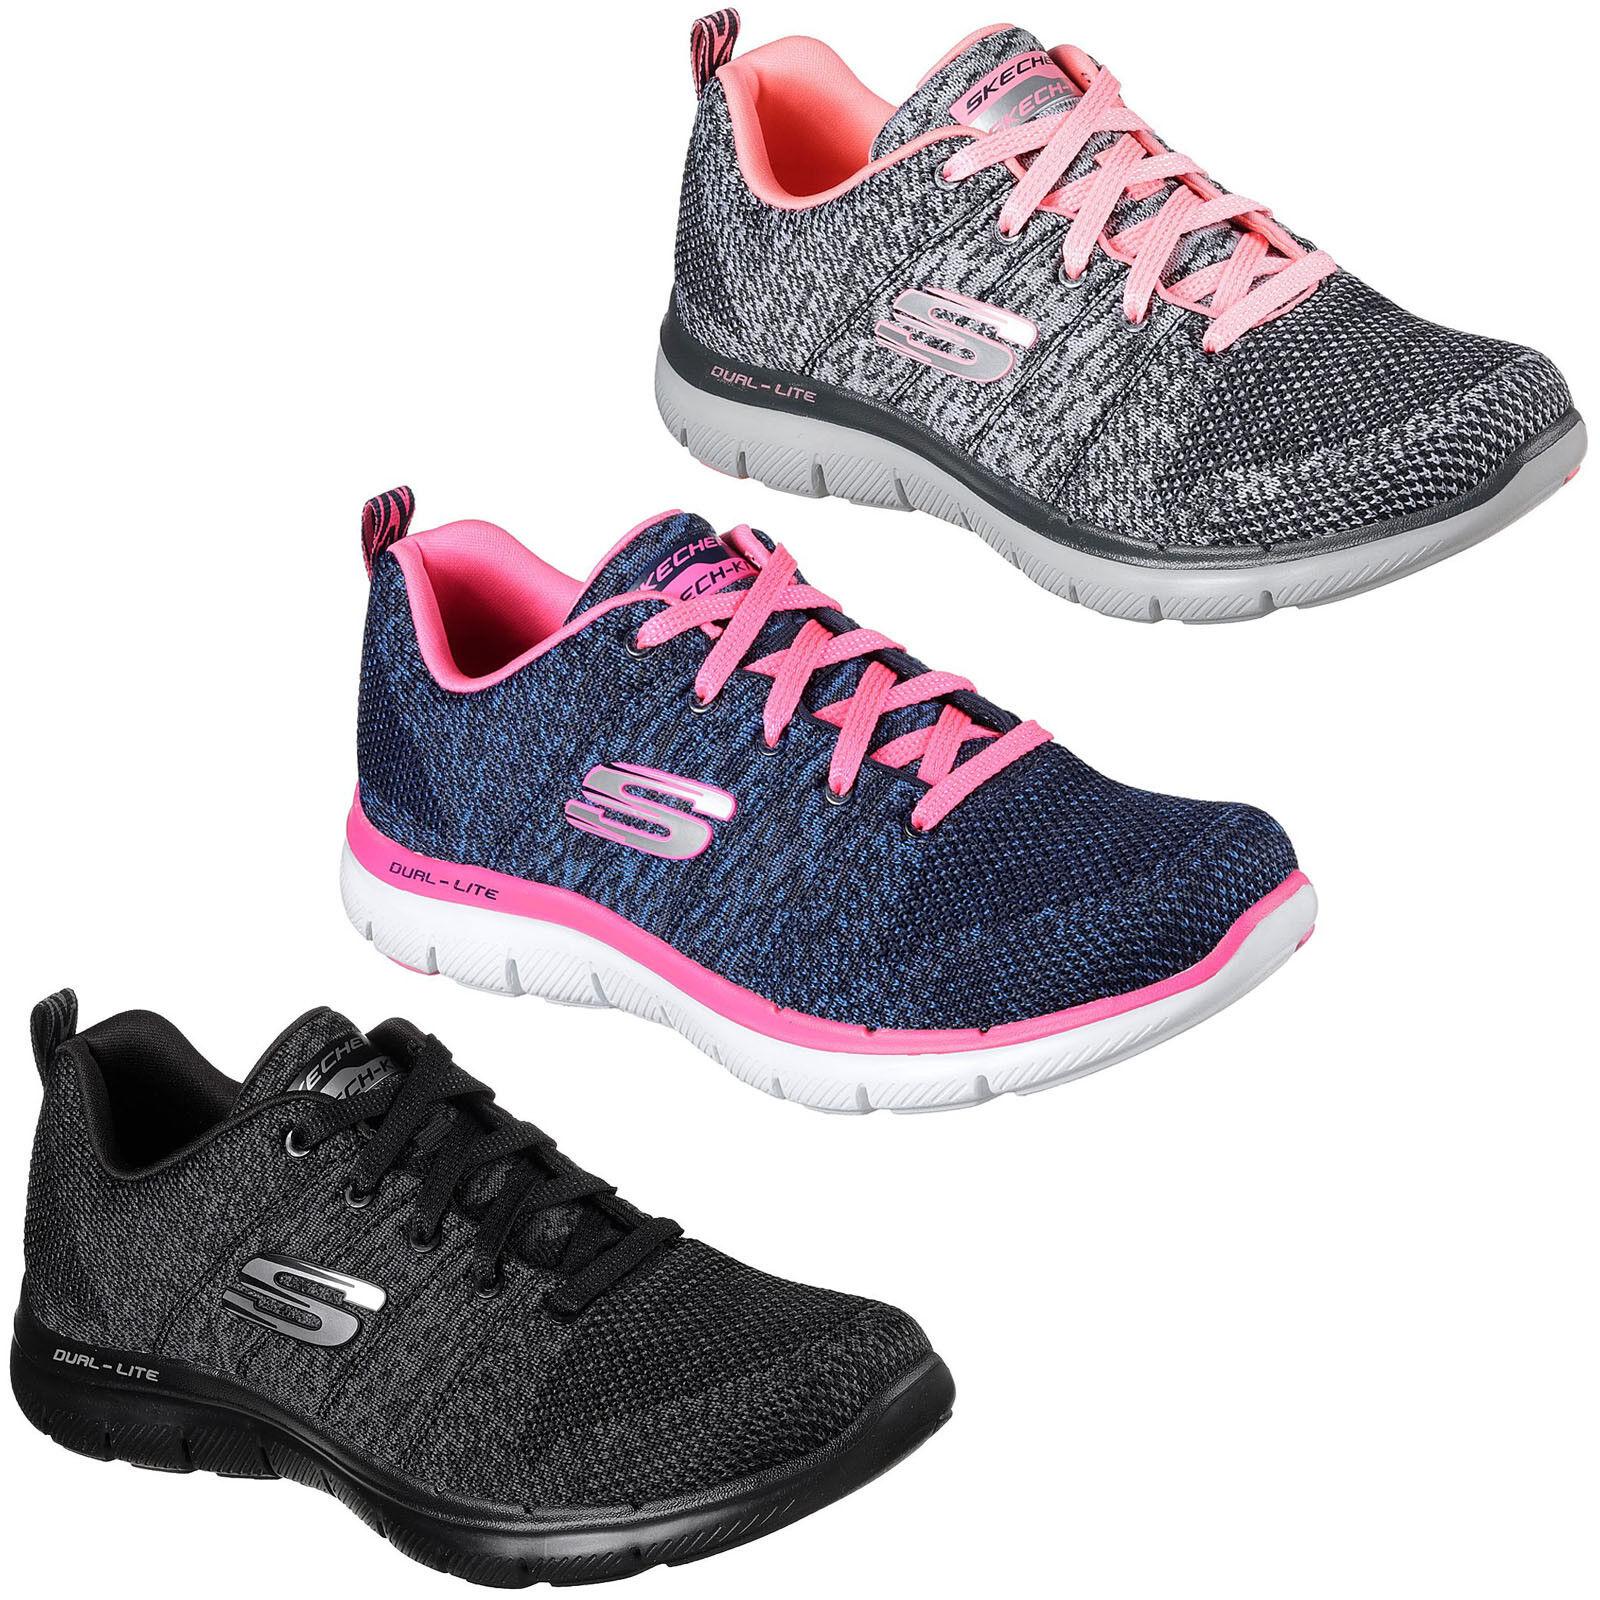 Skechers Flex Appeal 2.0 High Energy Women Charcoal Trainers UK Size 3-8